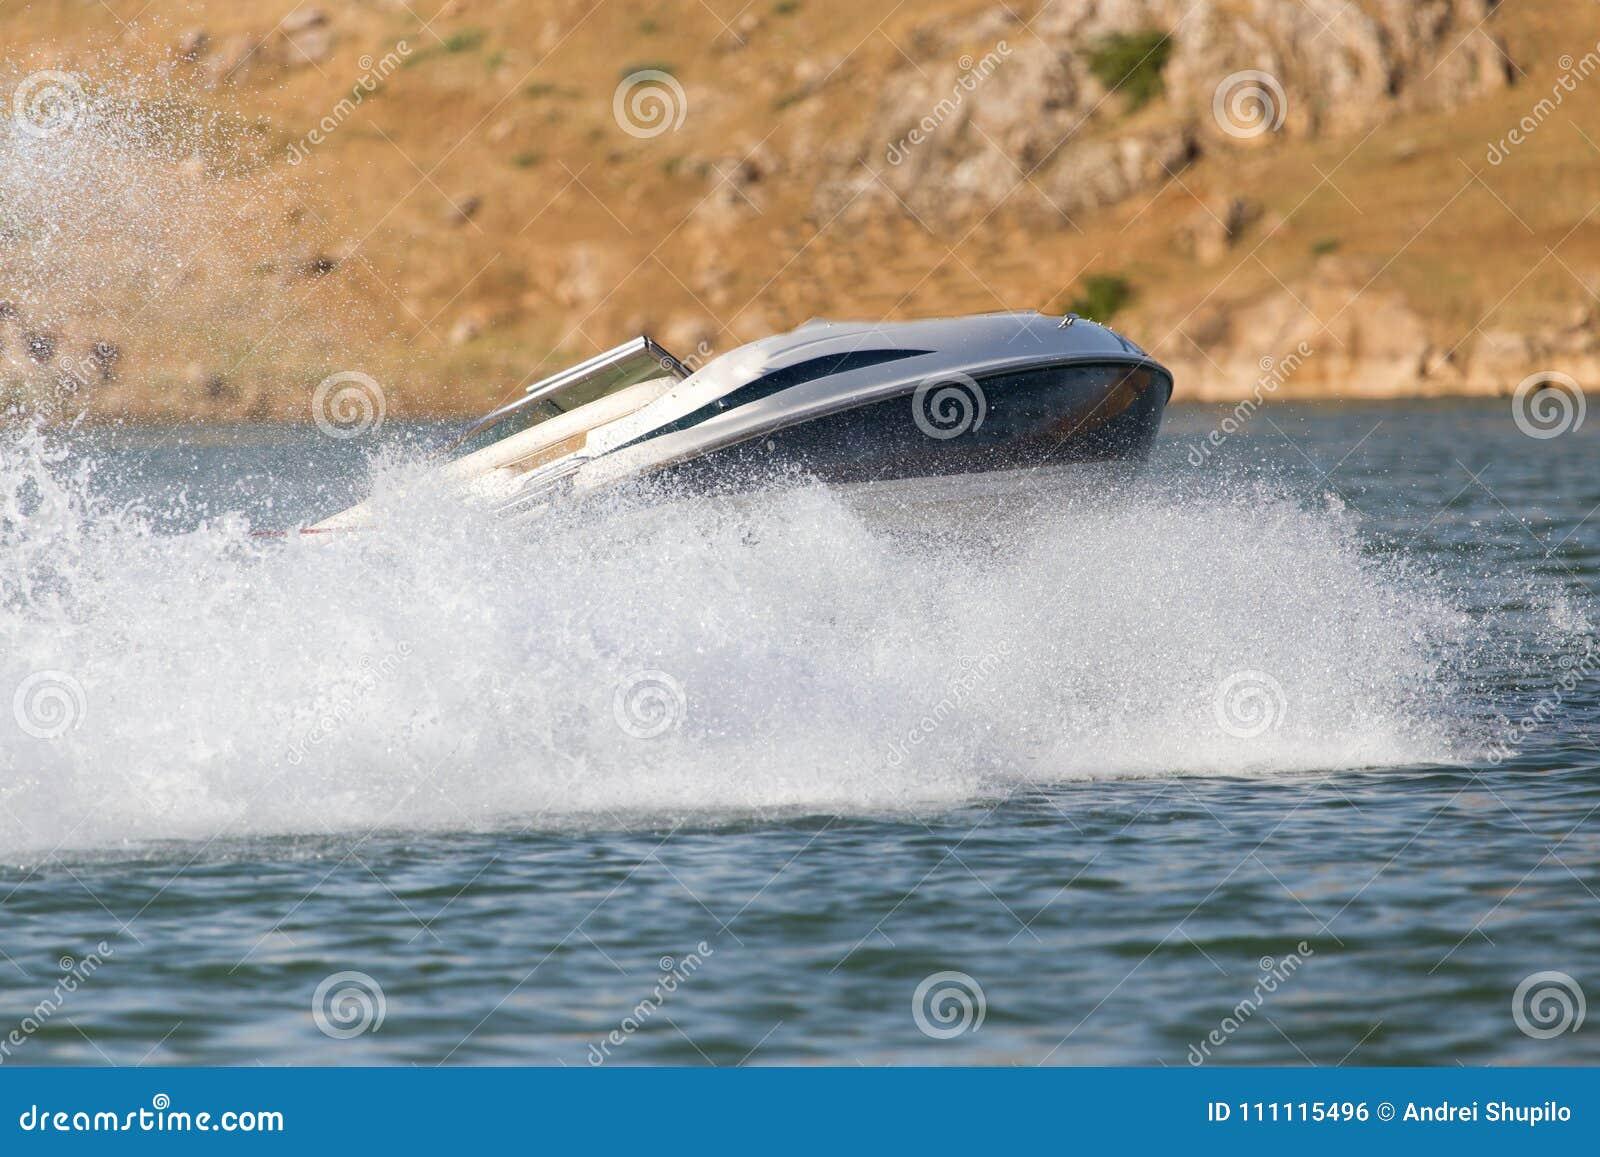 buoyancy material